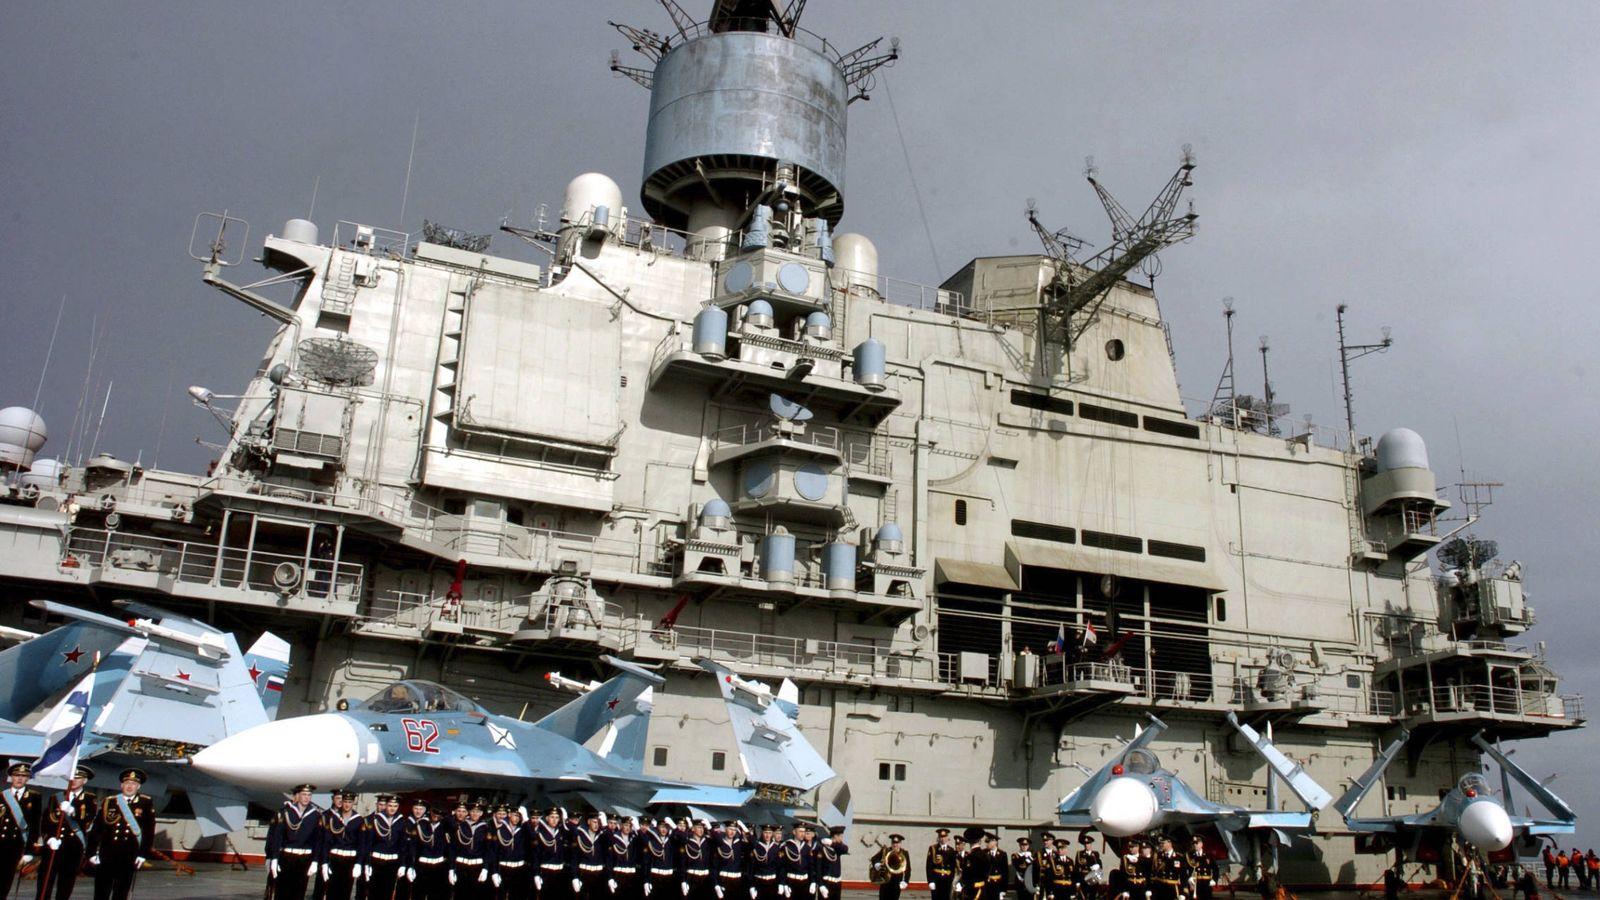 Foto: El portaaviones ruso Kuznetsov en la base naval de Tartus, Siria (Reuters).